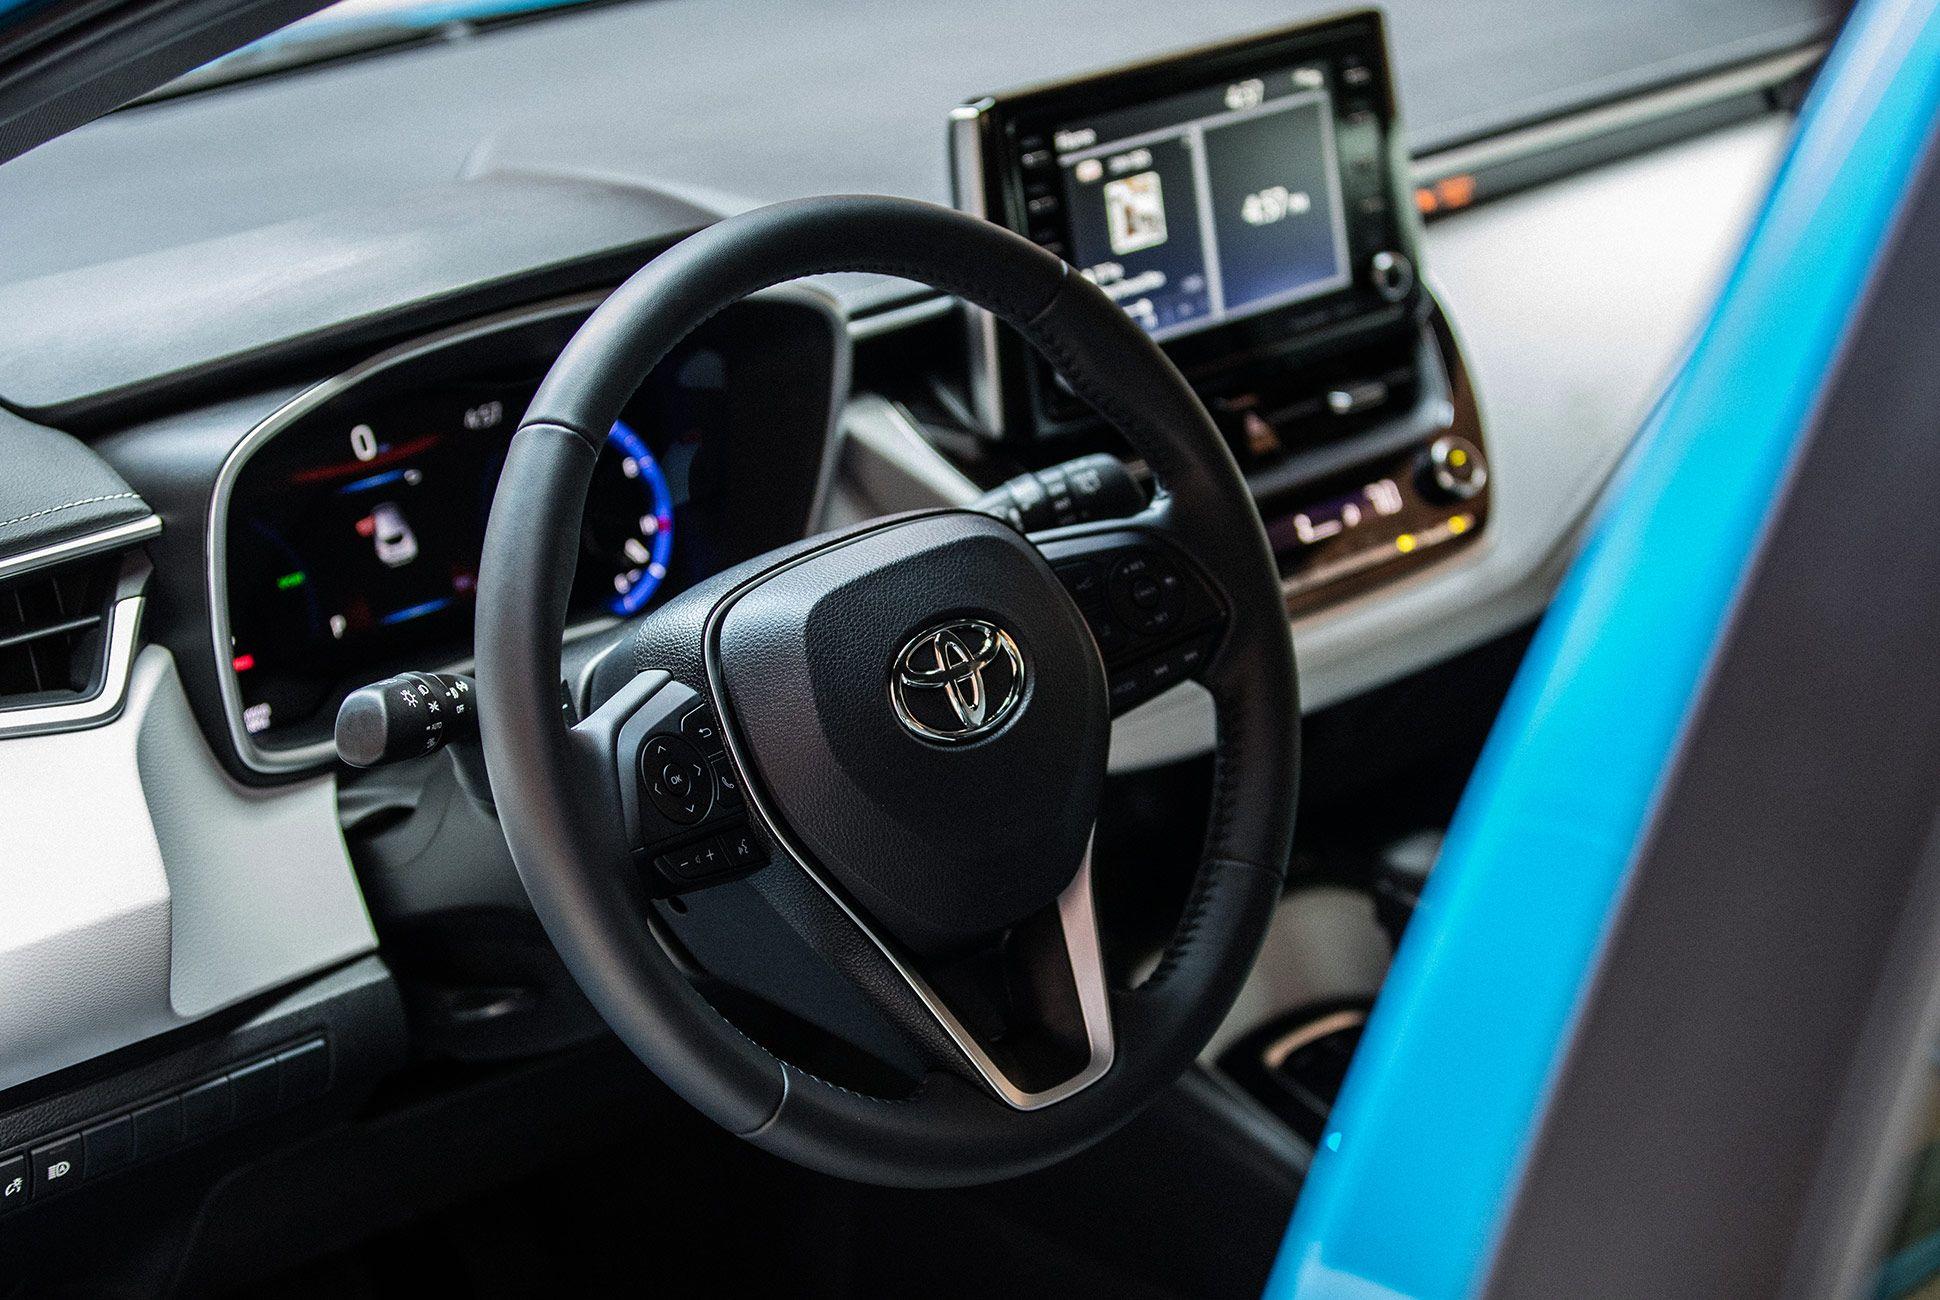 Toyota-Corolla-XSE-Hatch-Review-gear-patrol-slide-9